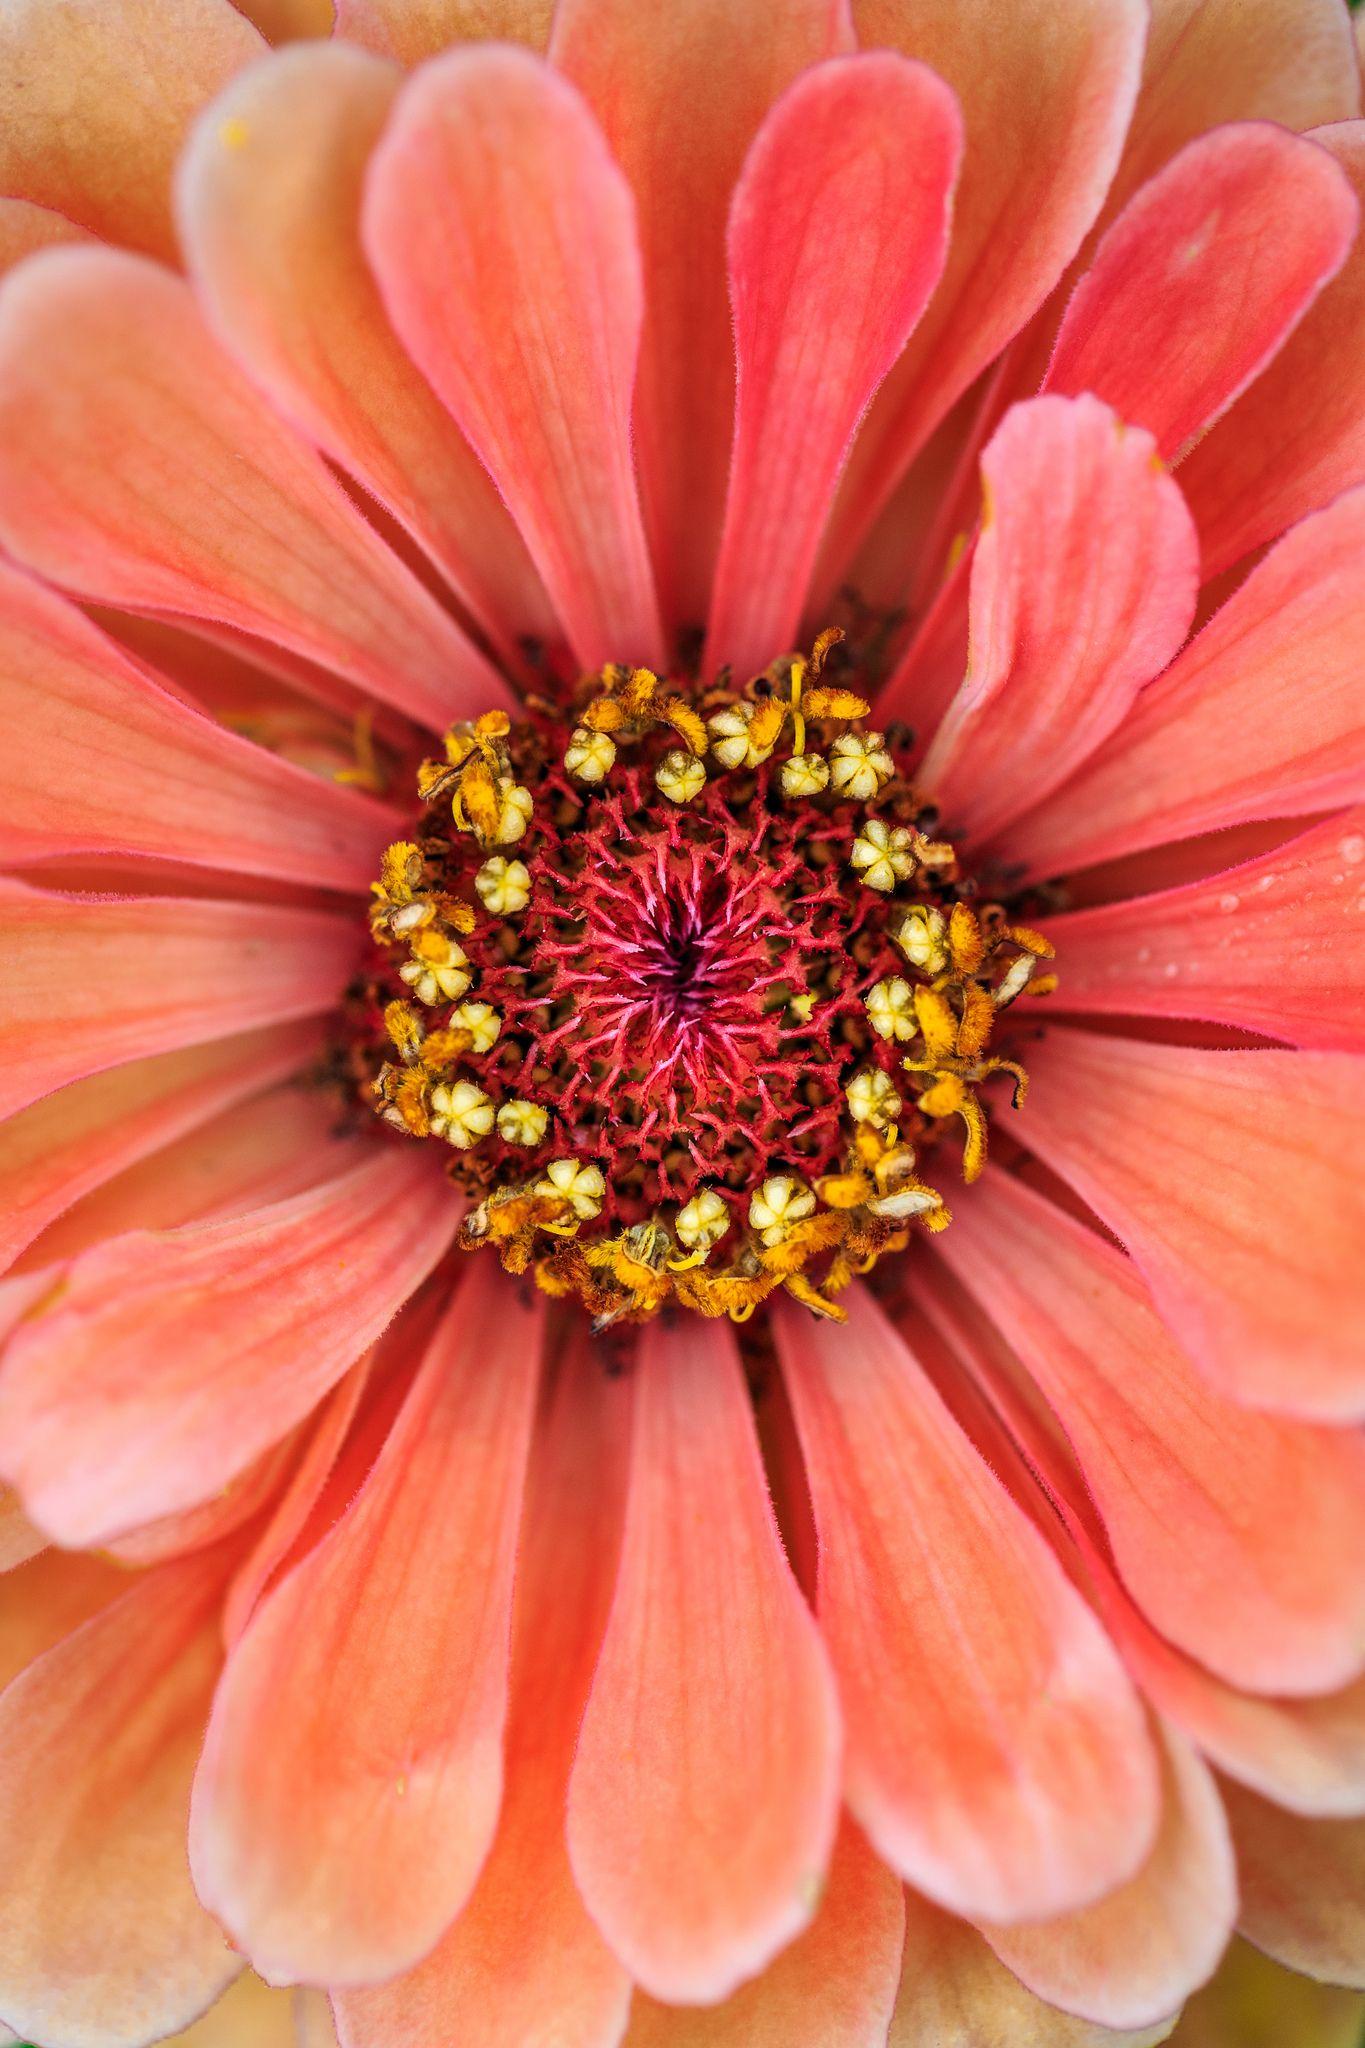 Img 0318 Jpg Most Beautiful Flowers Amazing Flowers Beautiful Flowers